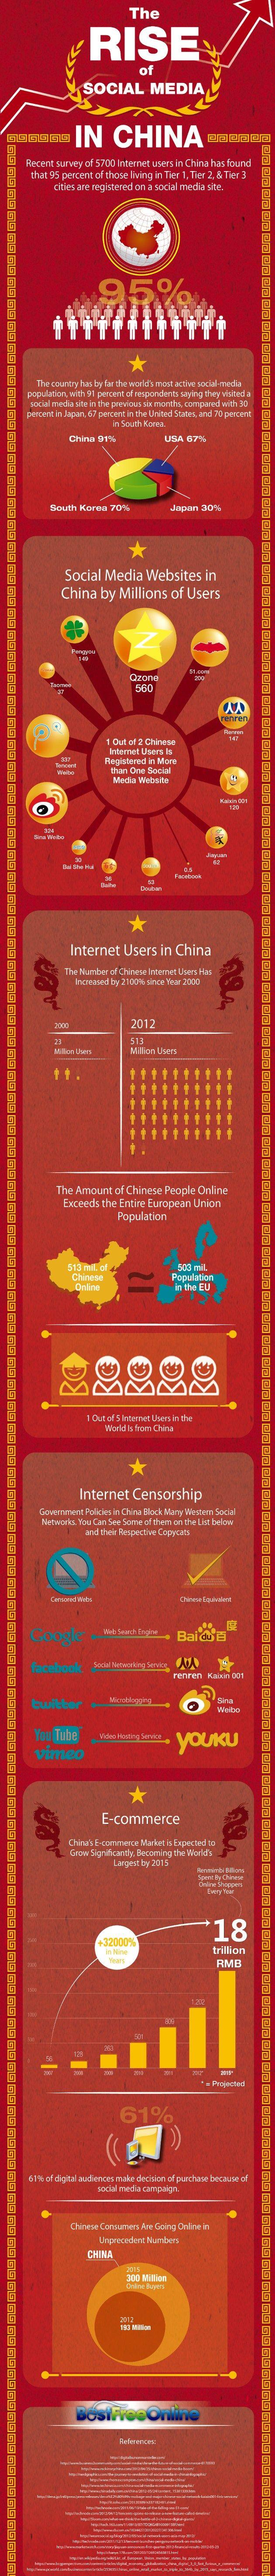 censura i multitud d'usuaris seran compatibles? - The Rise of Social Media in China Infographic 2012